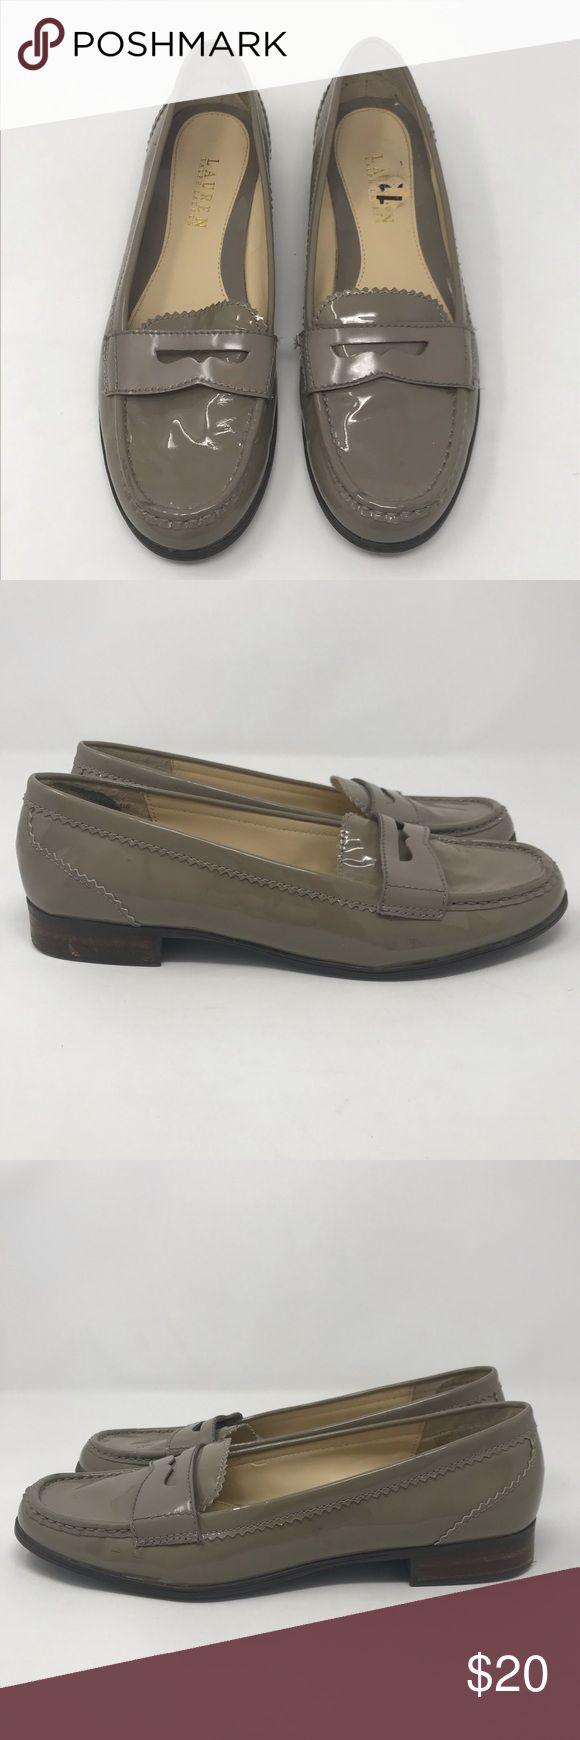 Lauren Ralph Lauren Shoes Womens Size 8 B Brown Leather